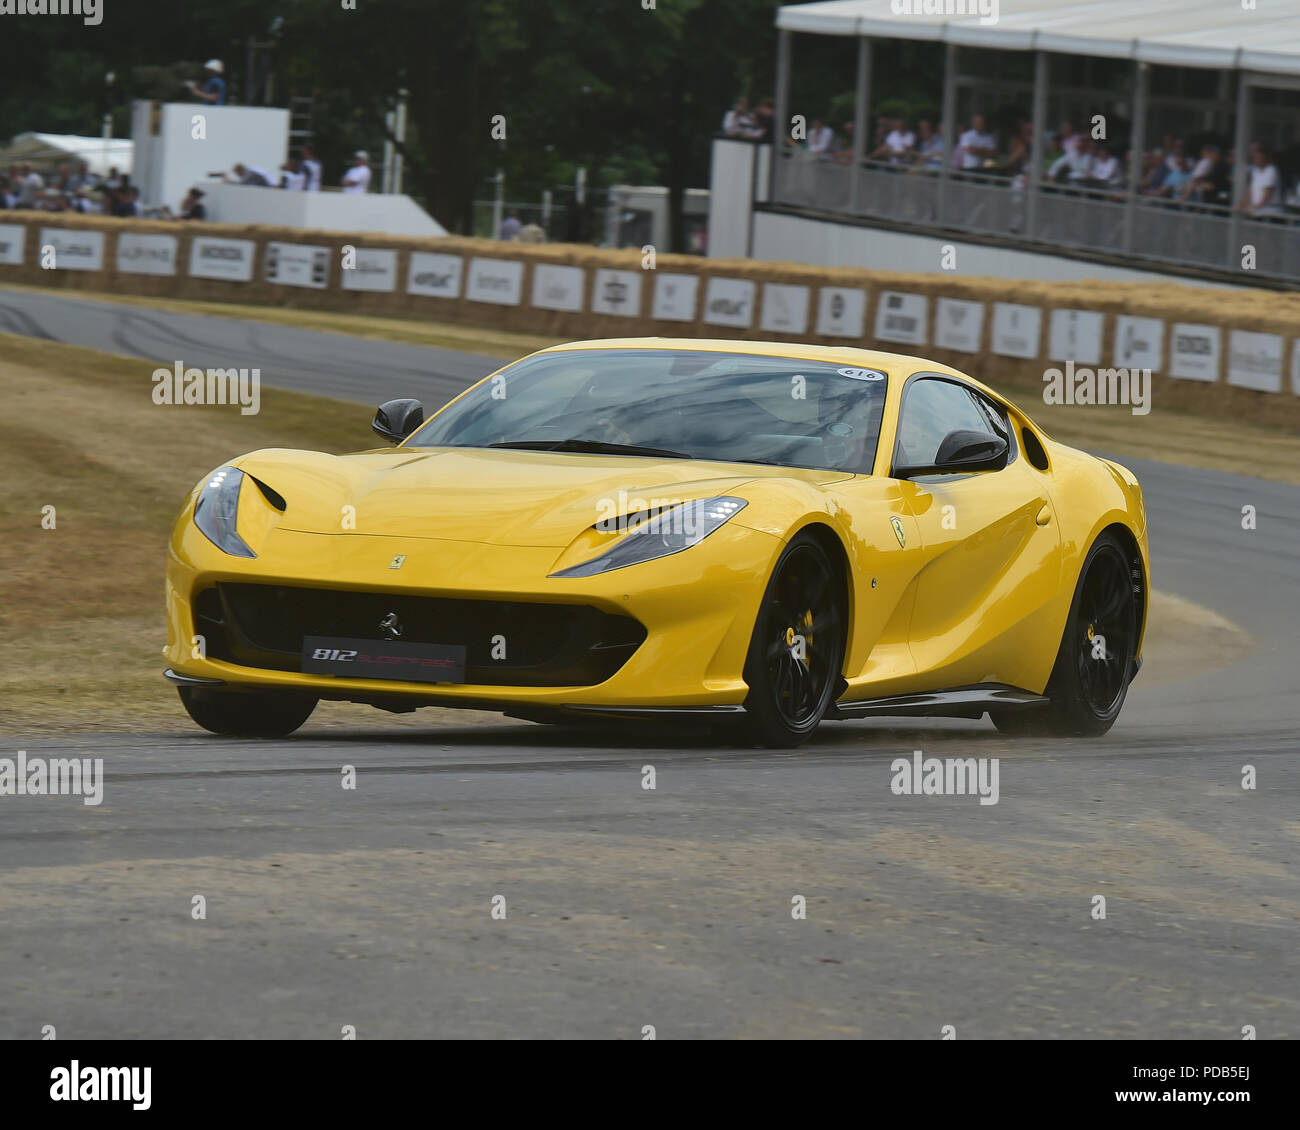 Ferrari Superfast Stock Photos & Ferrari Superfast Stock